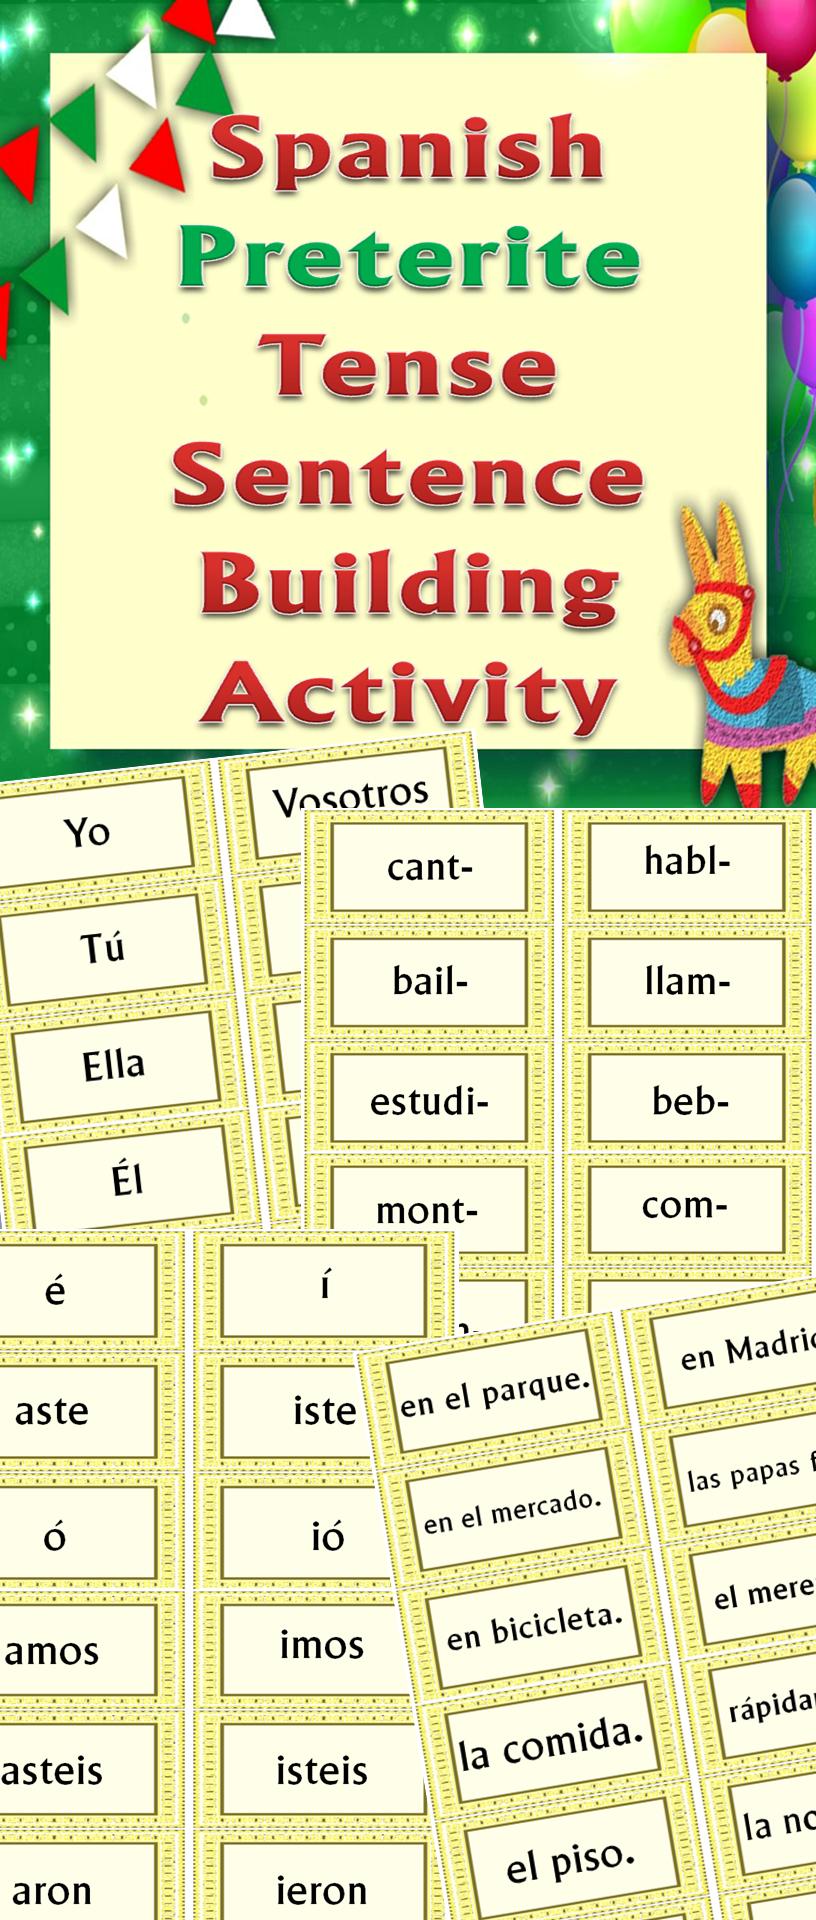 Hands On Activity Making Spanish Preterite Tense Sentences Preterite Spanish Spanish Preterite Tense Spanish Language Learning [ 1920 x 816 Pixel ]